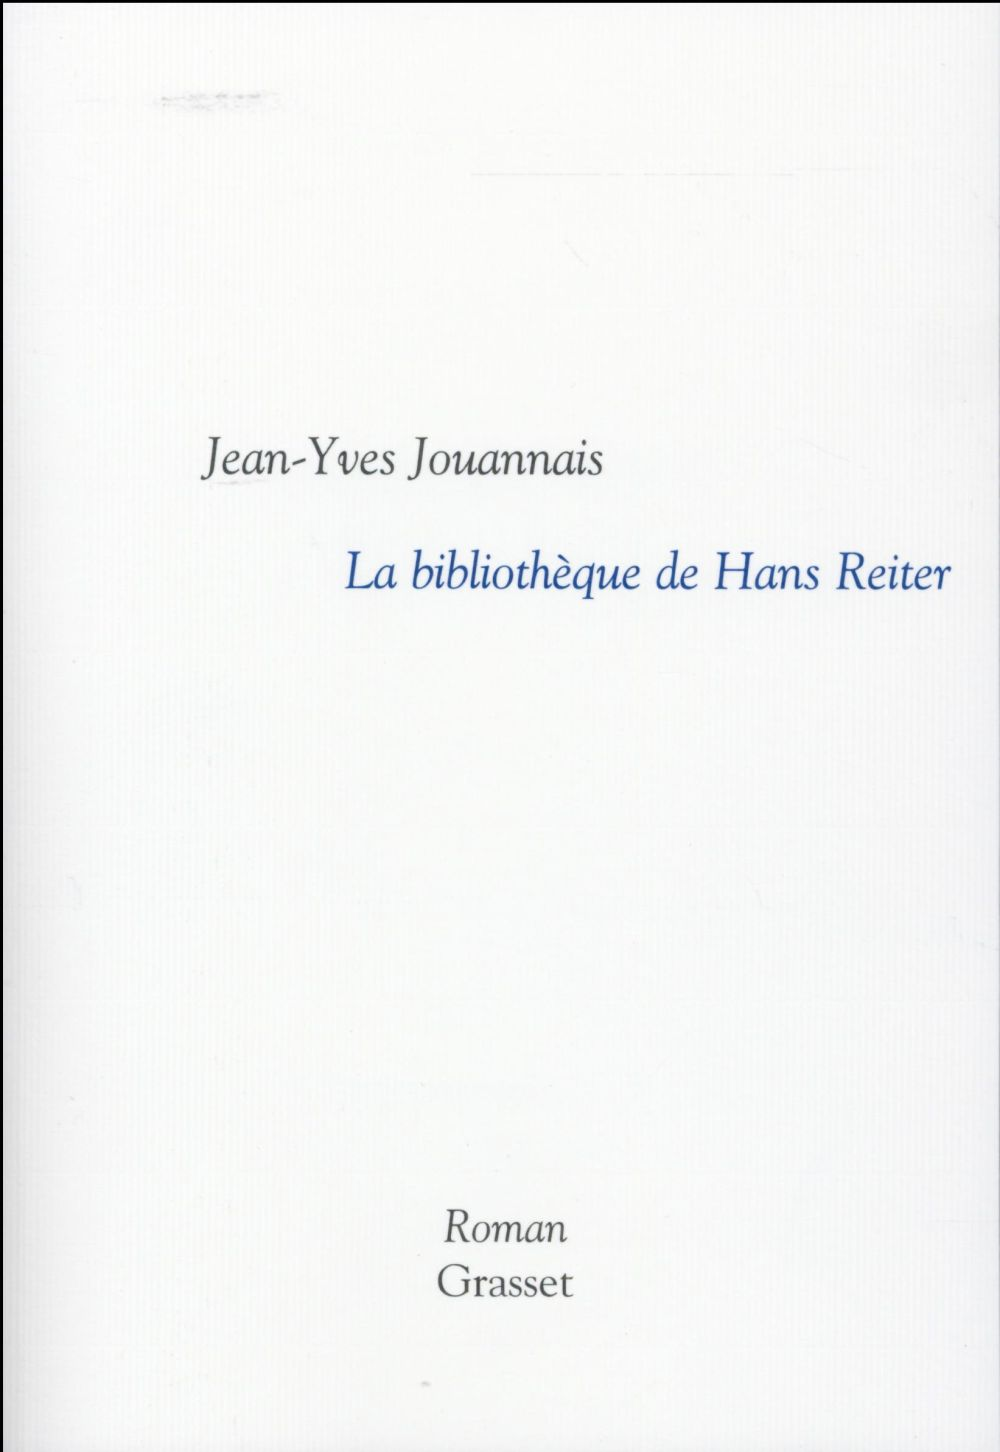 La bibliothèque de Hans Reiter